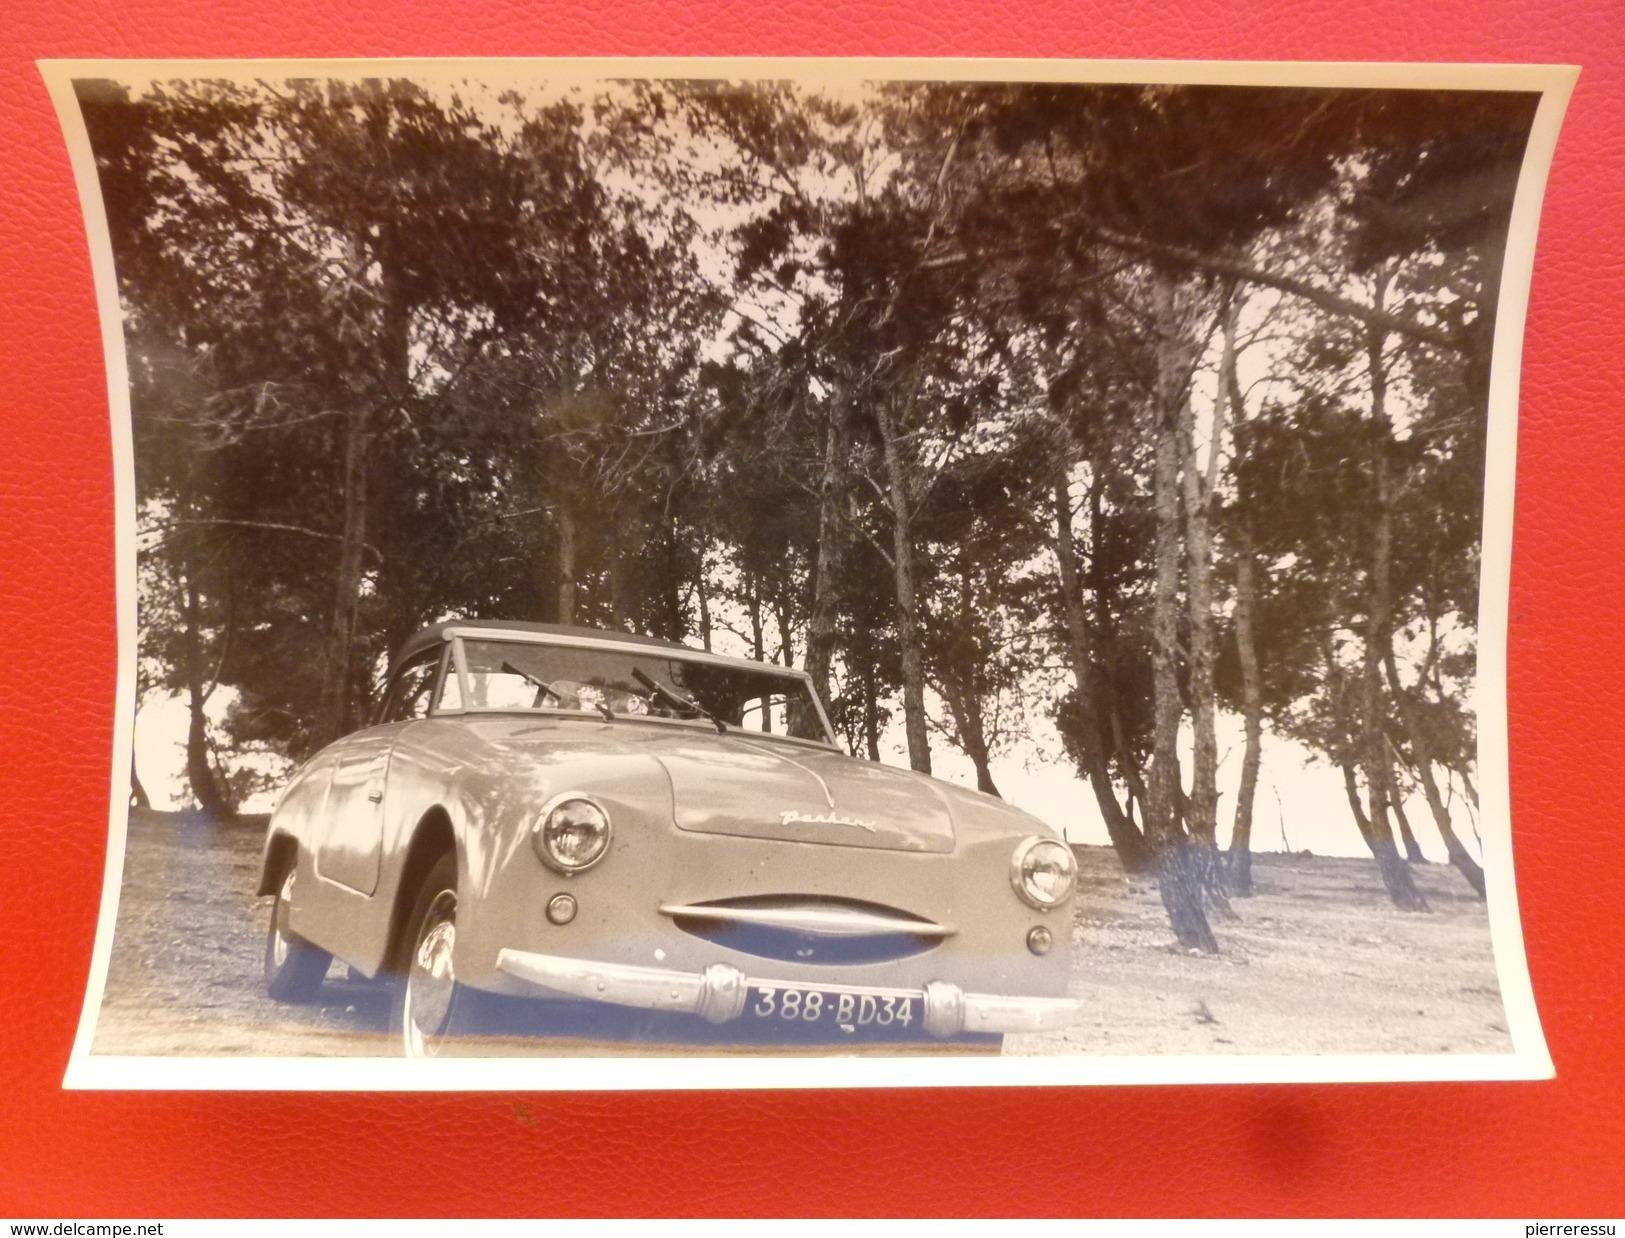 488_002_auto-voiture-panhard-cabriolet-decapotable-a-enserume-photo-18-x-13